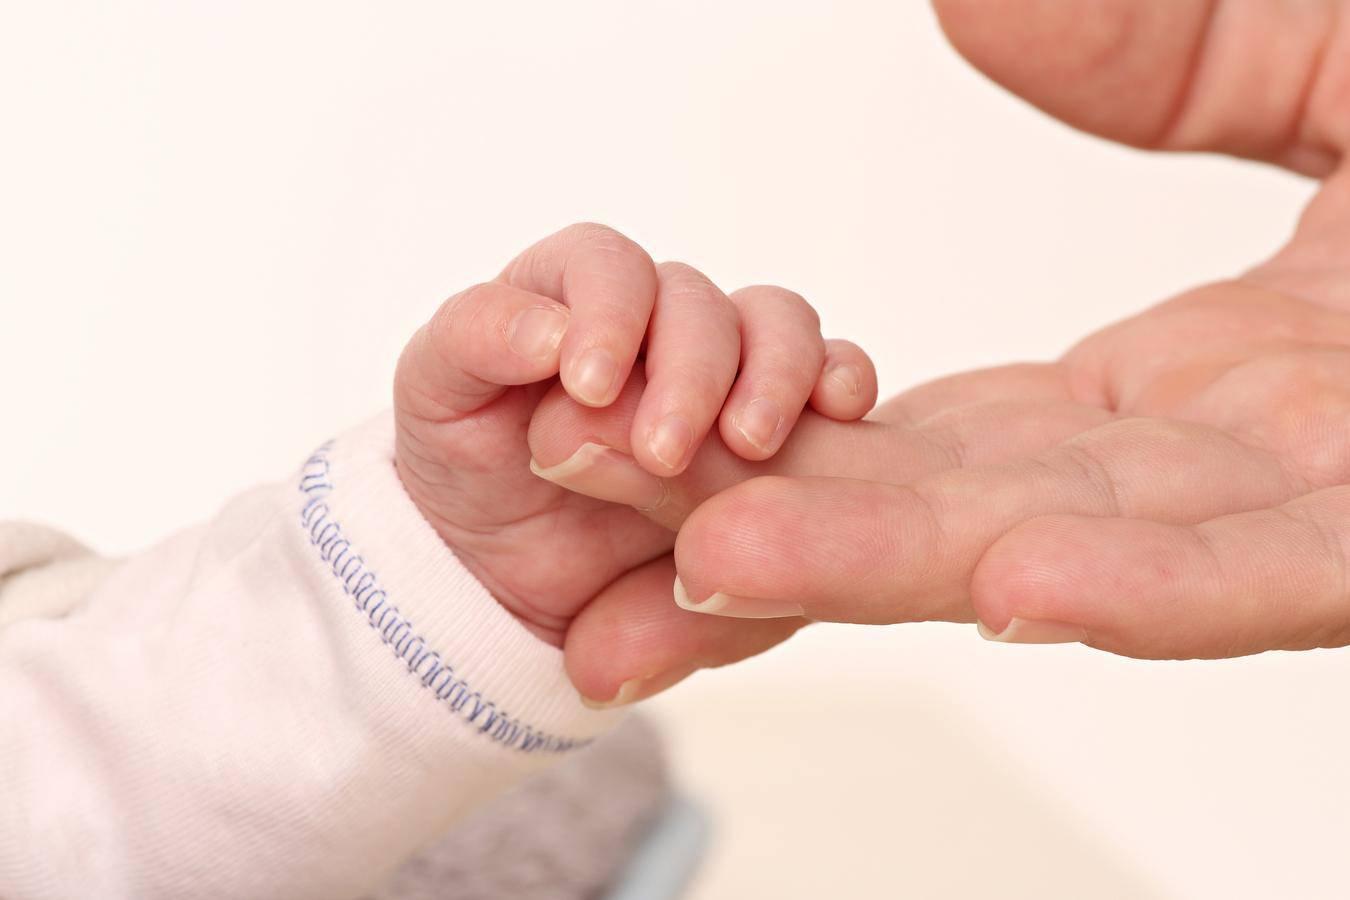 Hebamme - Entbindungspfleger